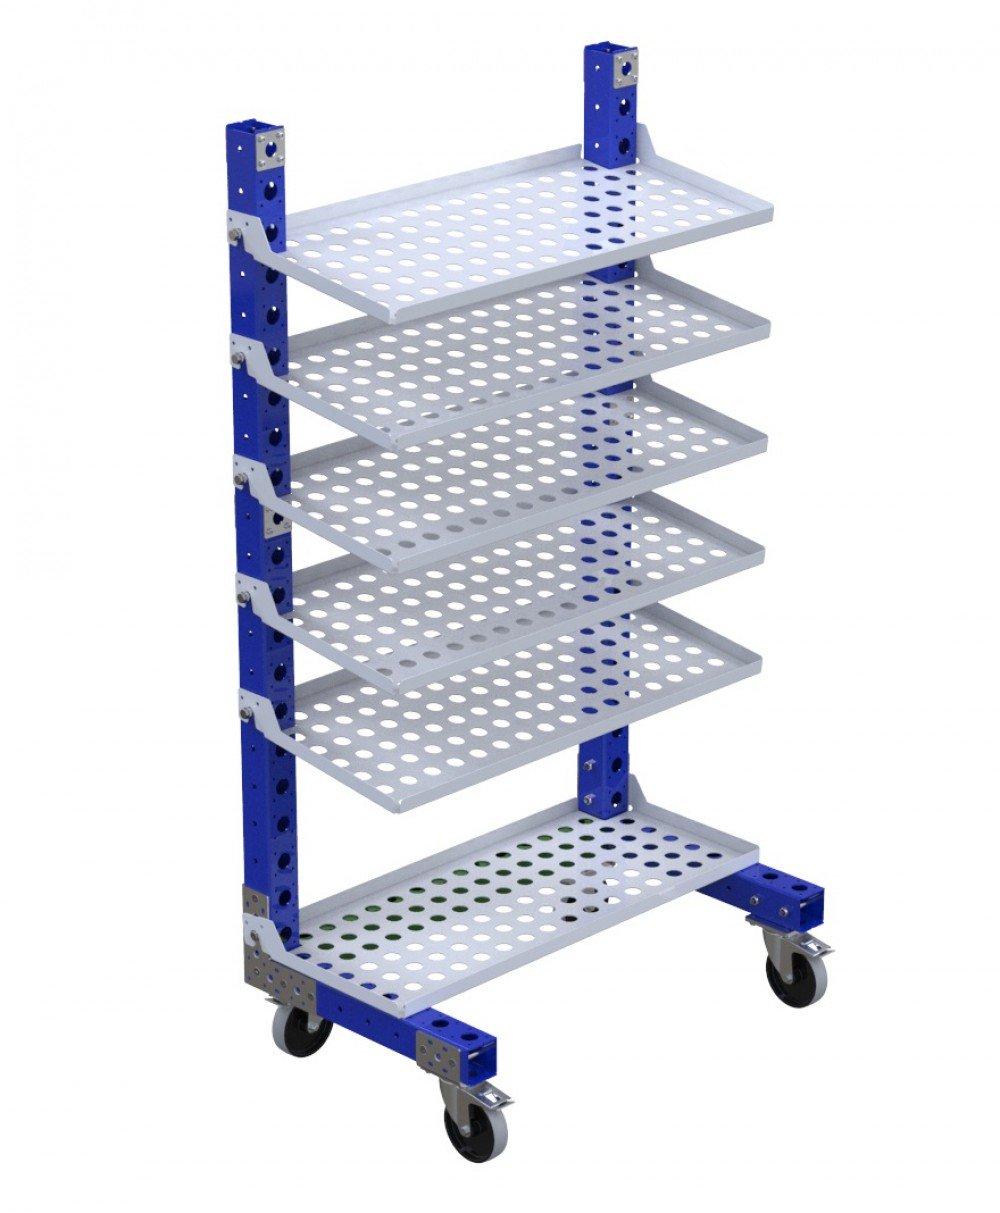 Modular removable shelf cart